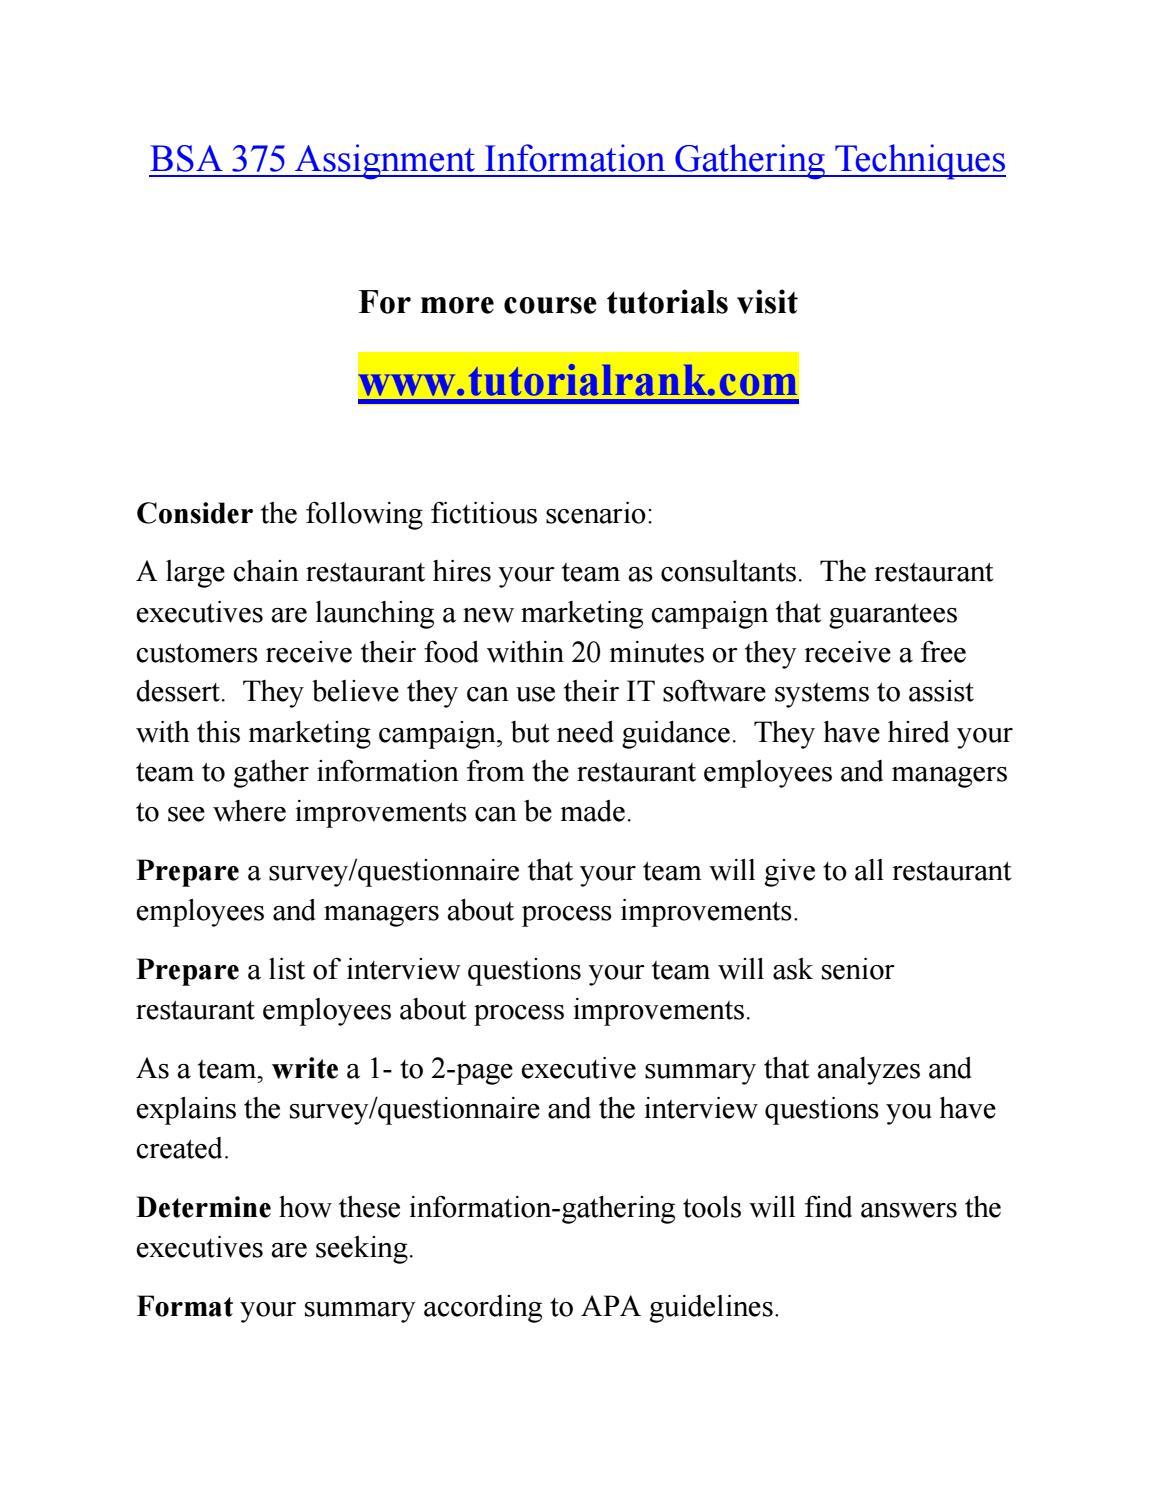 BSA 375 Effective Communication/tutorialrank com by